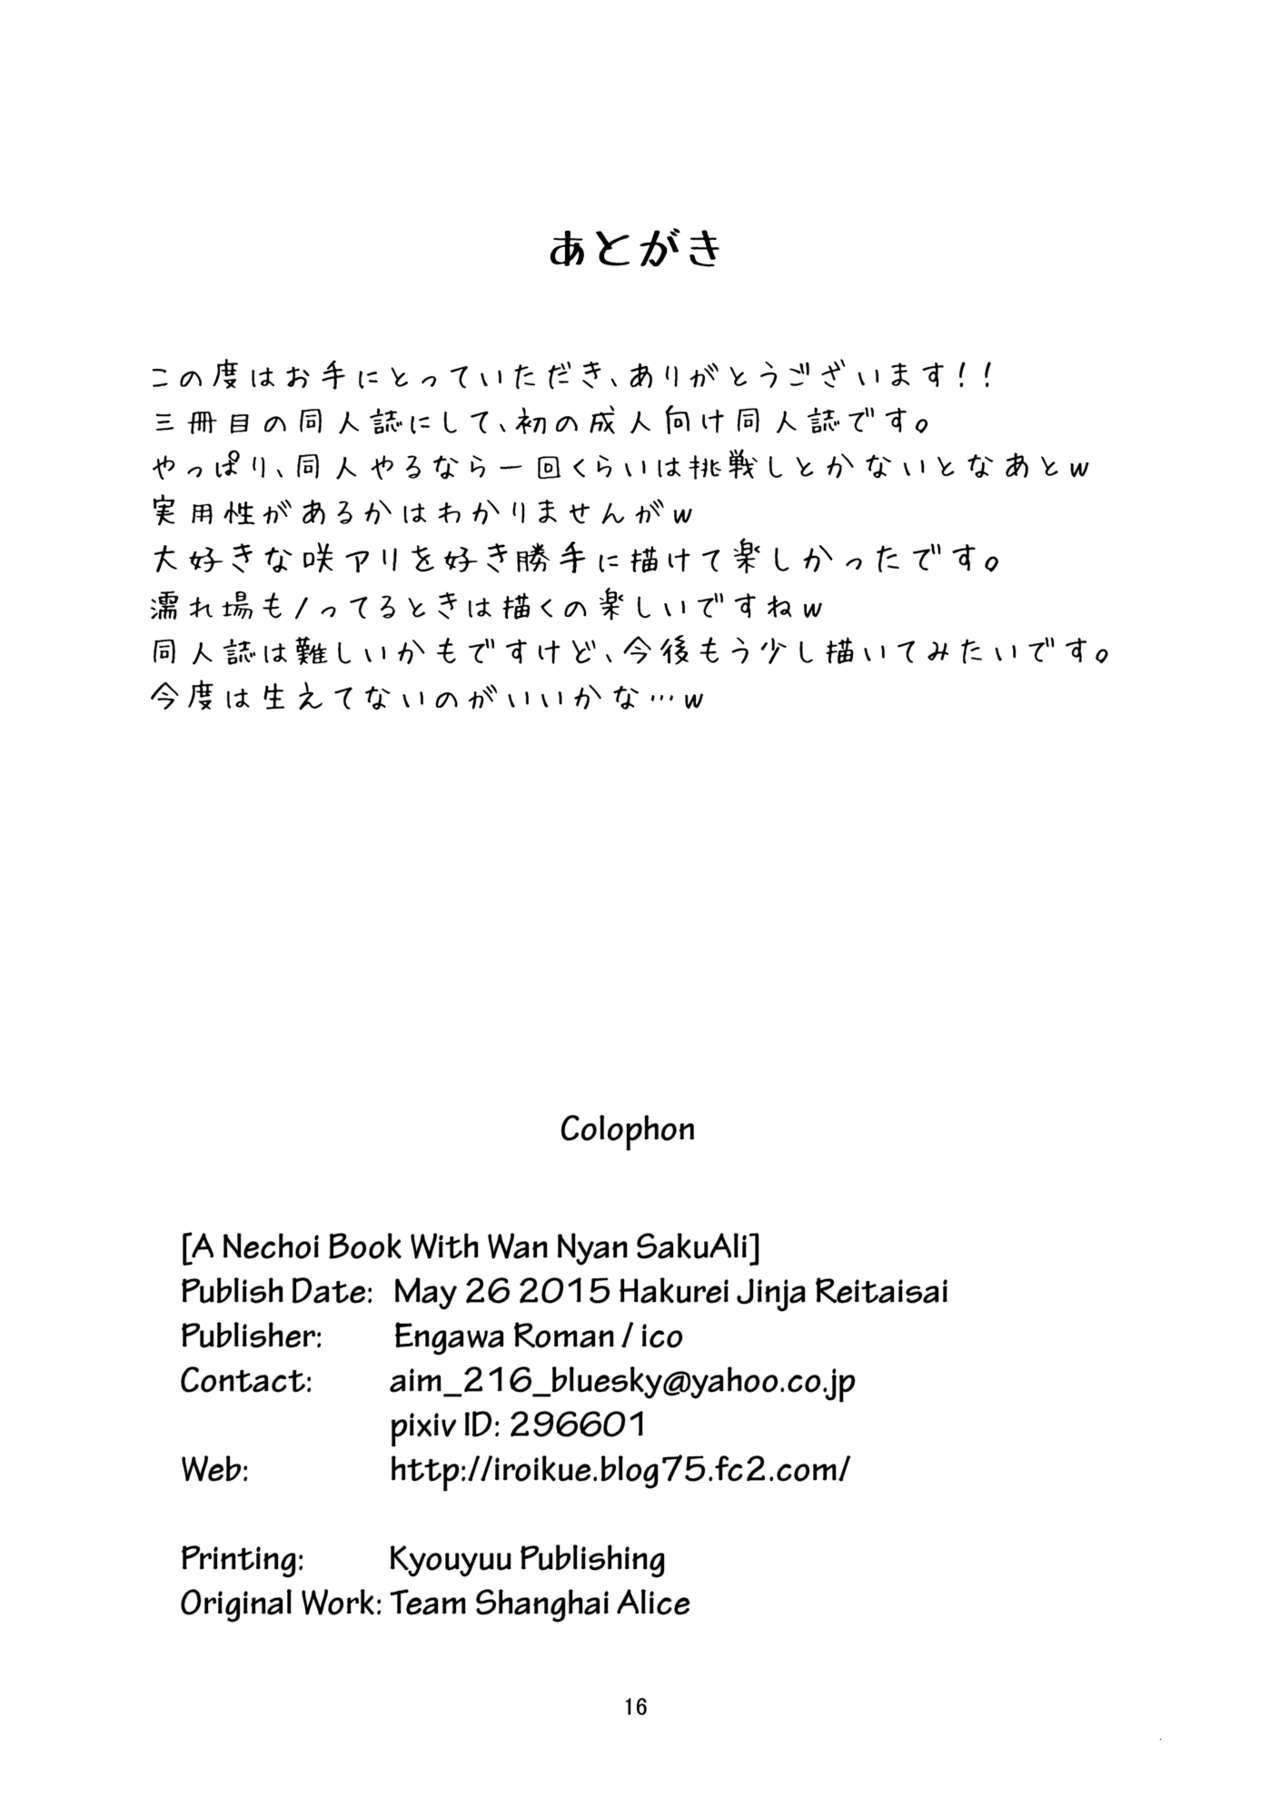 Wan Nyan Saku Ali de Nechoi Hon 16